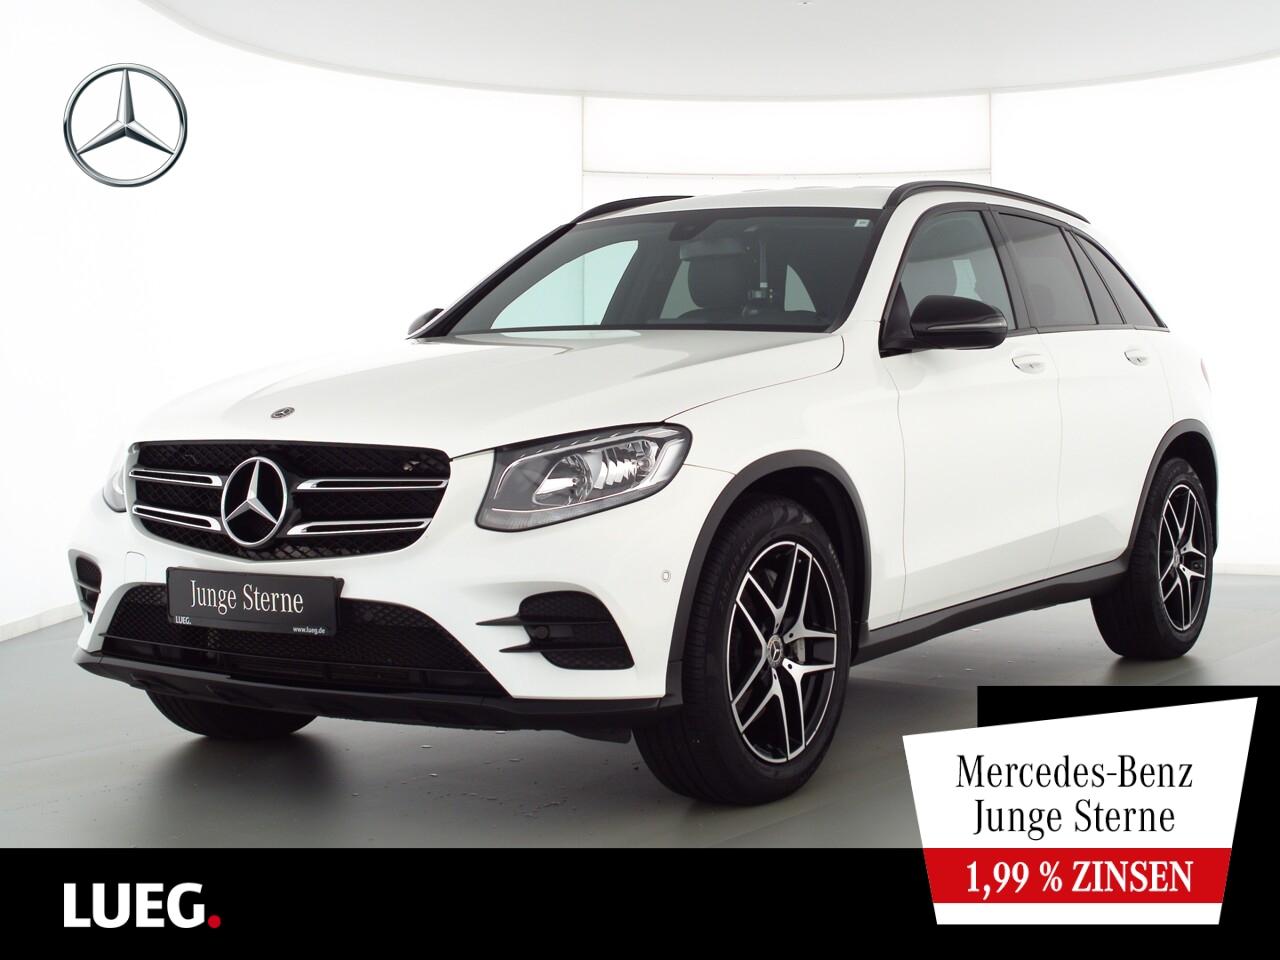 Mercedes-Benz GLC 250 d 4M AMG+Navi+Sthzg+19''+AHK+Night+Kamer, Jahr 2017, Diesel